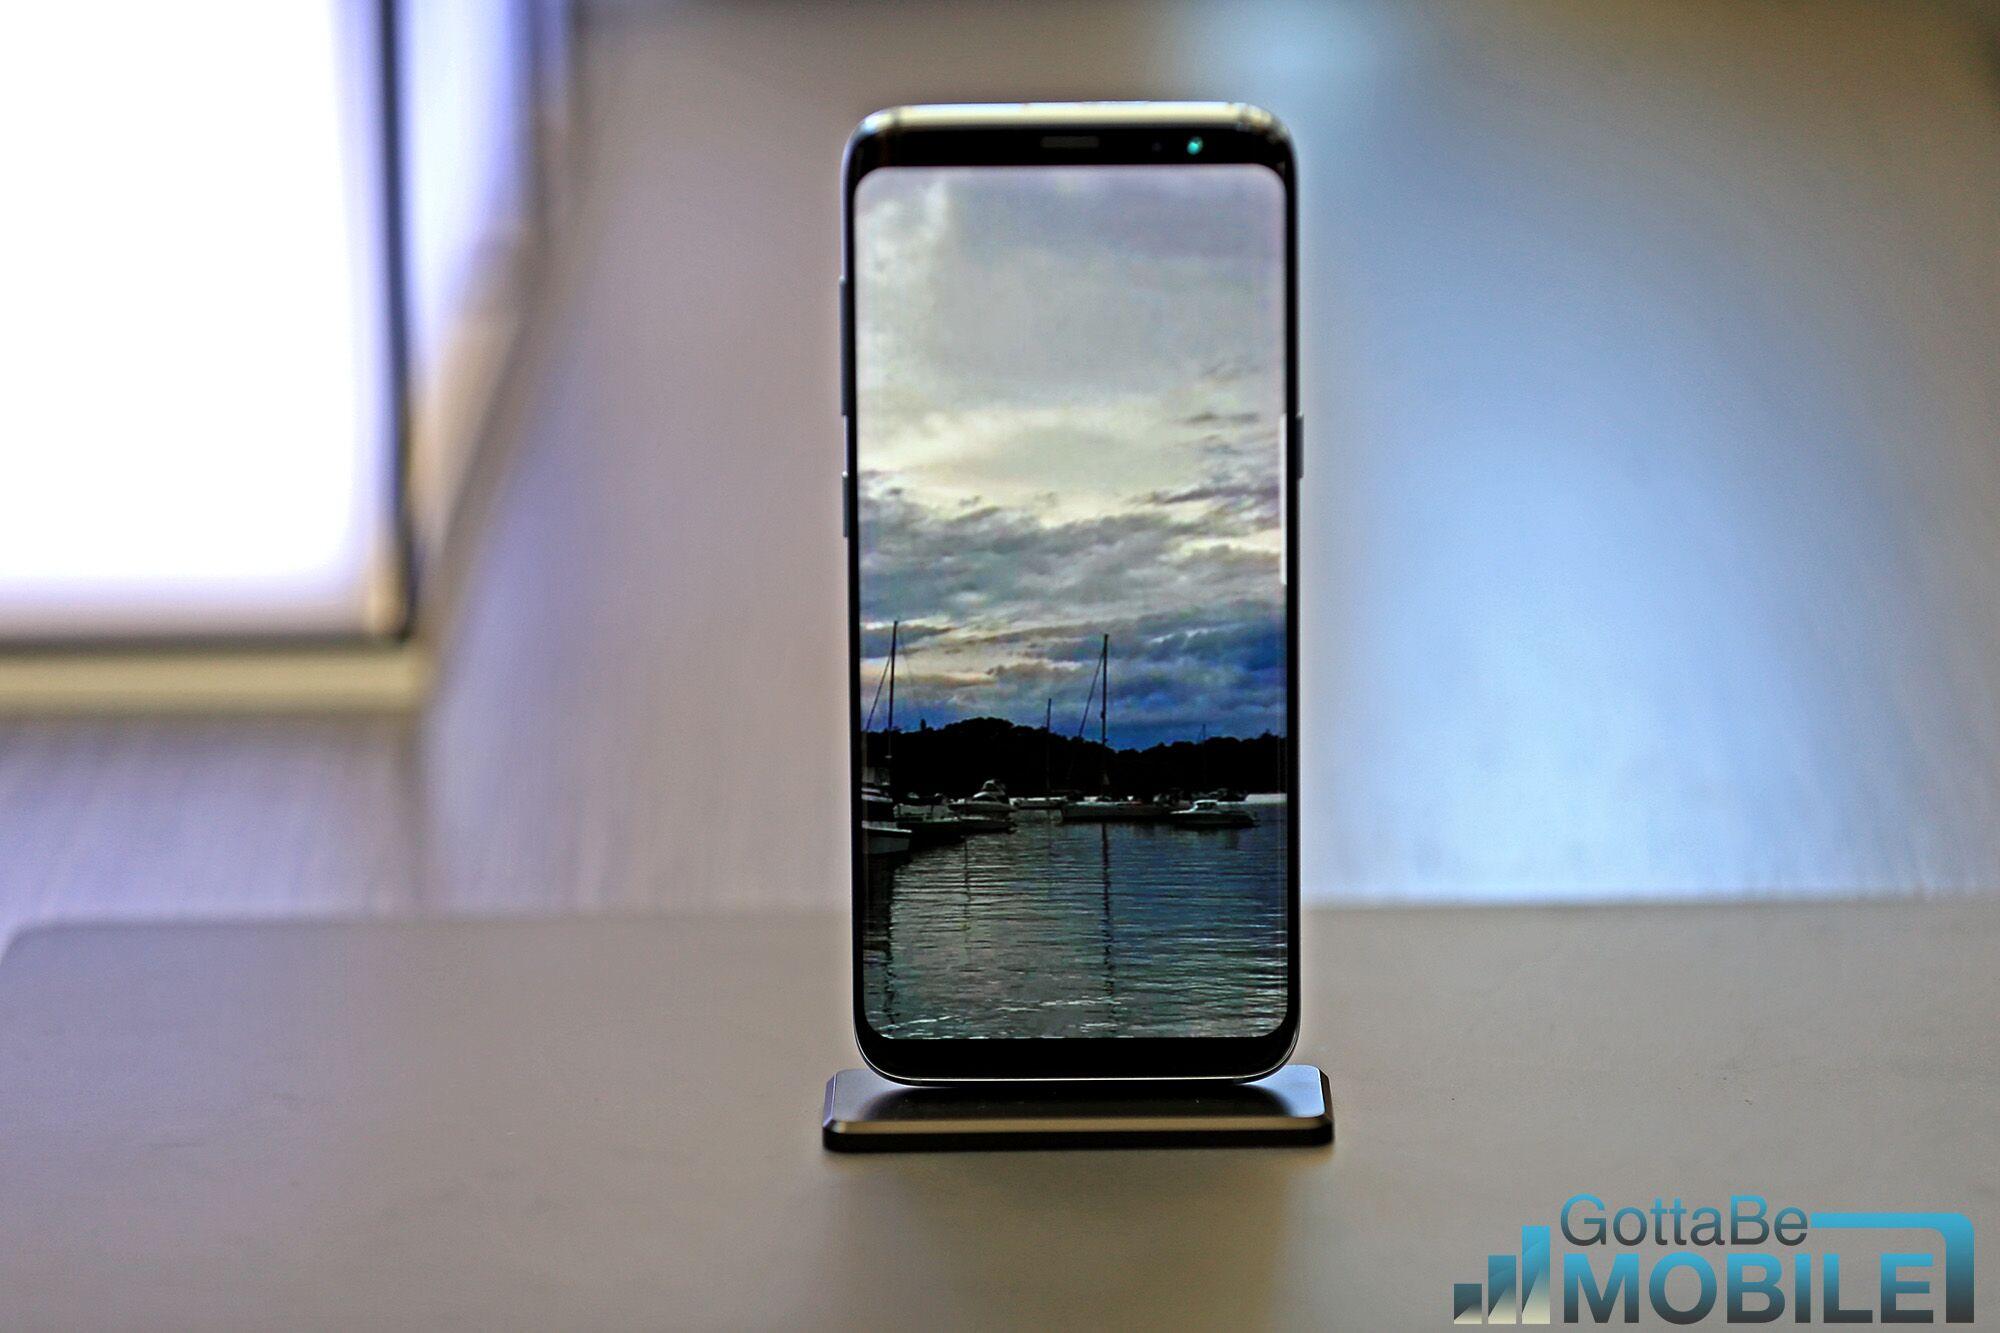 How to Change the Galaxy S8 Lockscreen & Wallpaper